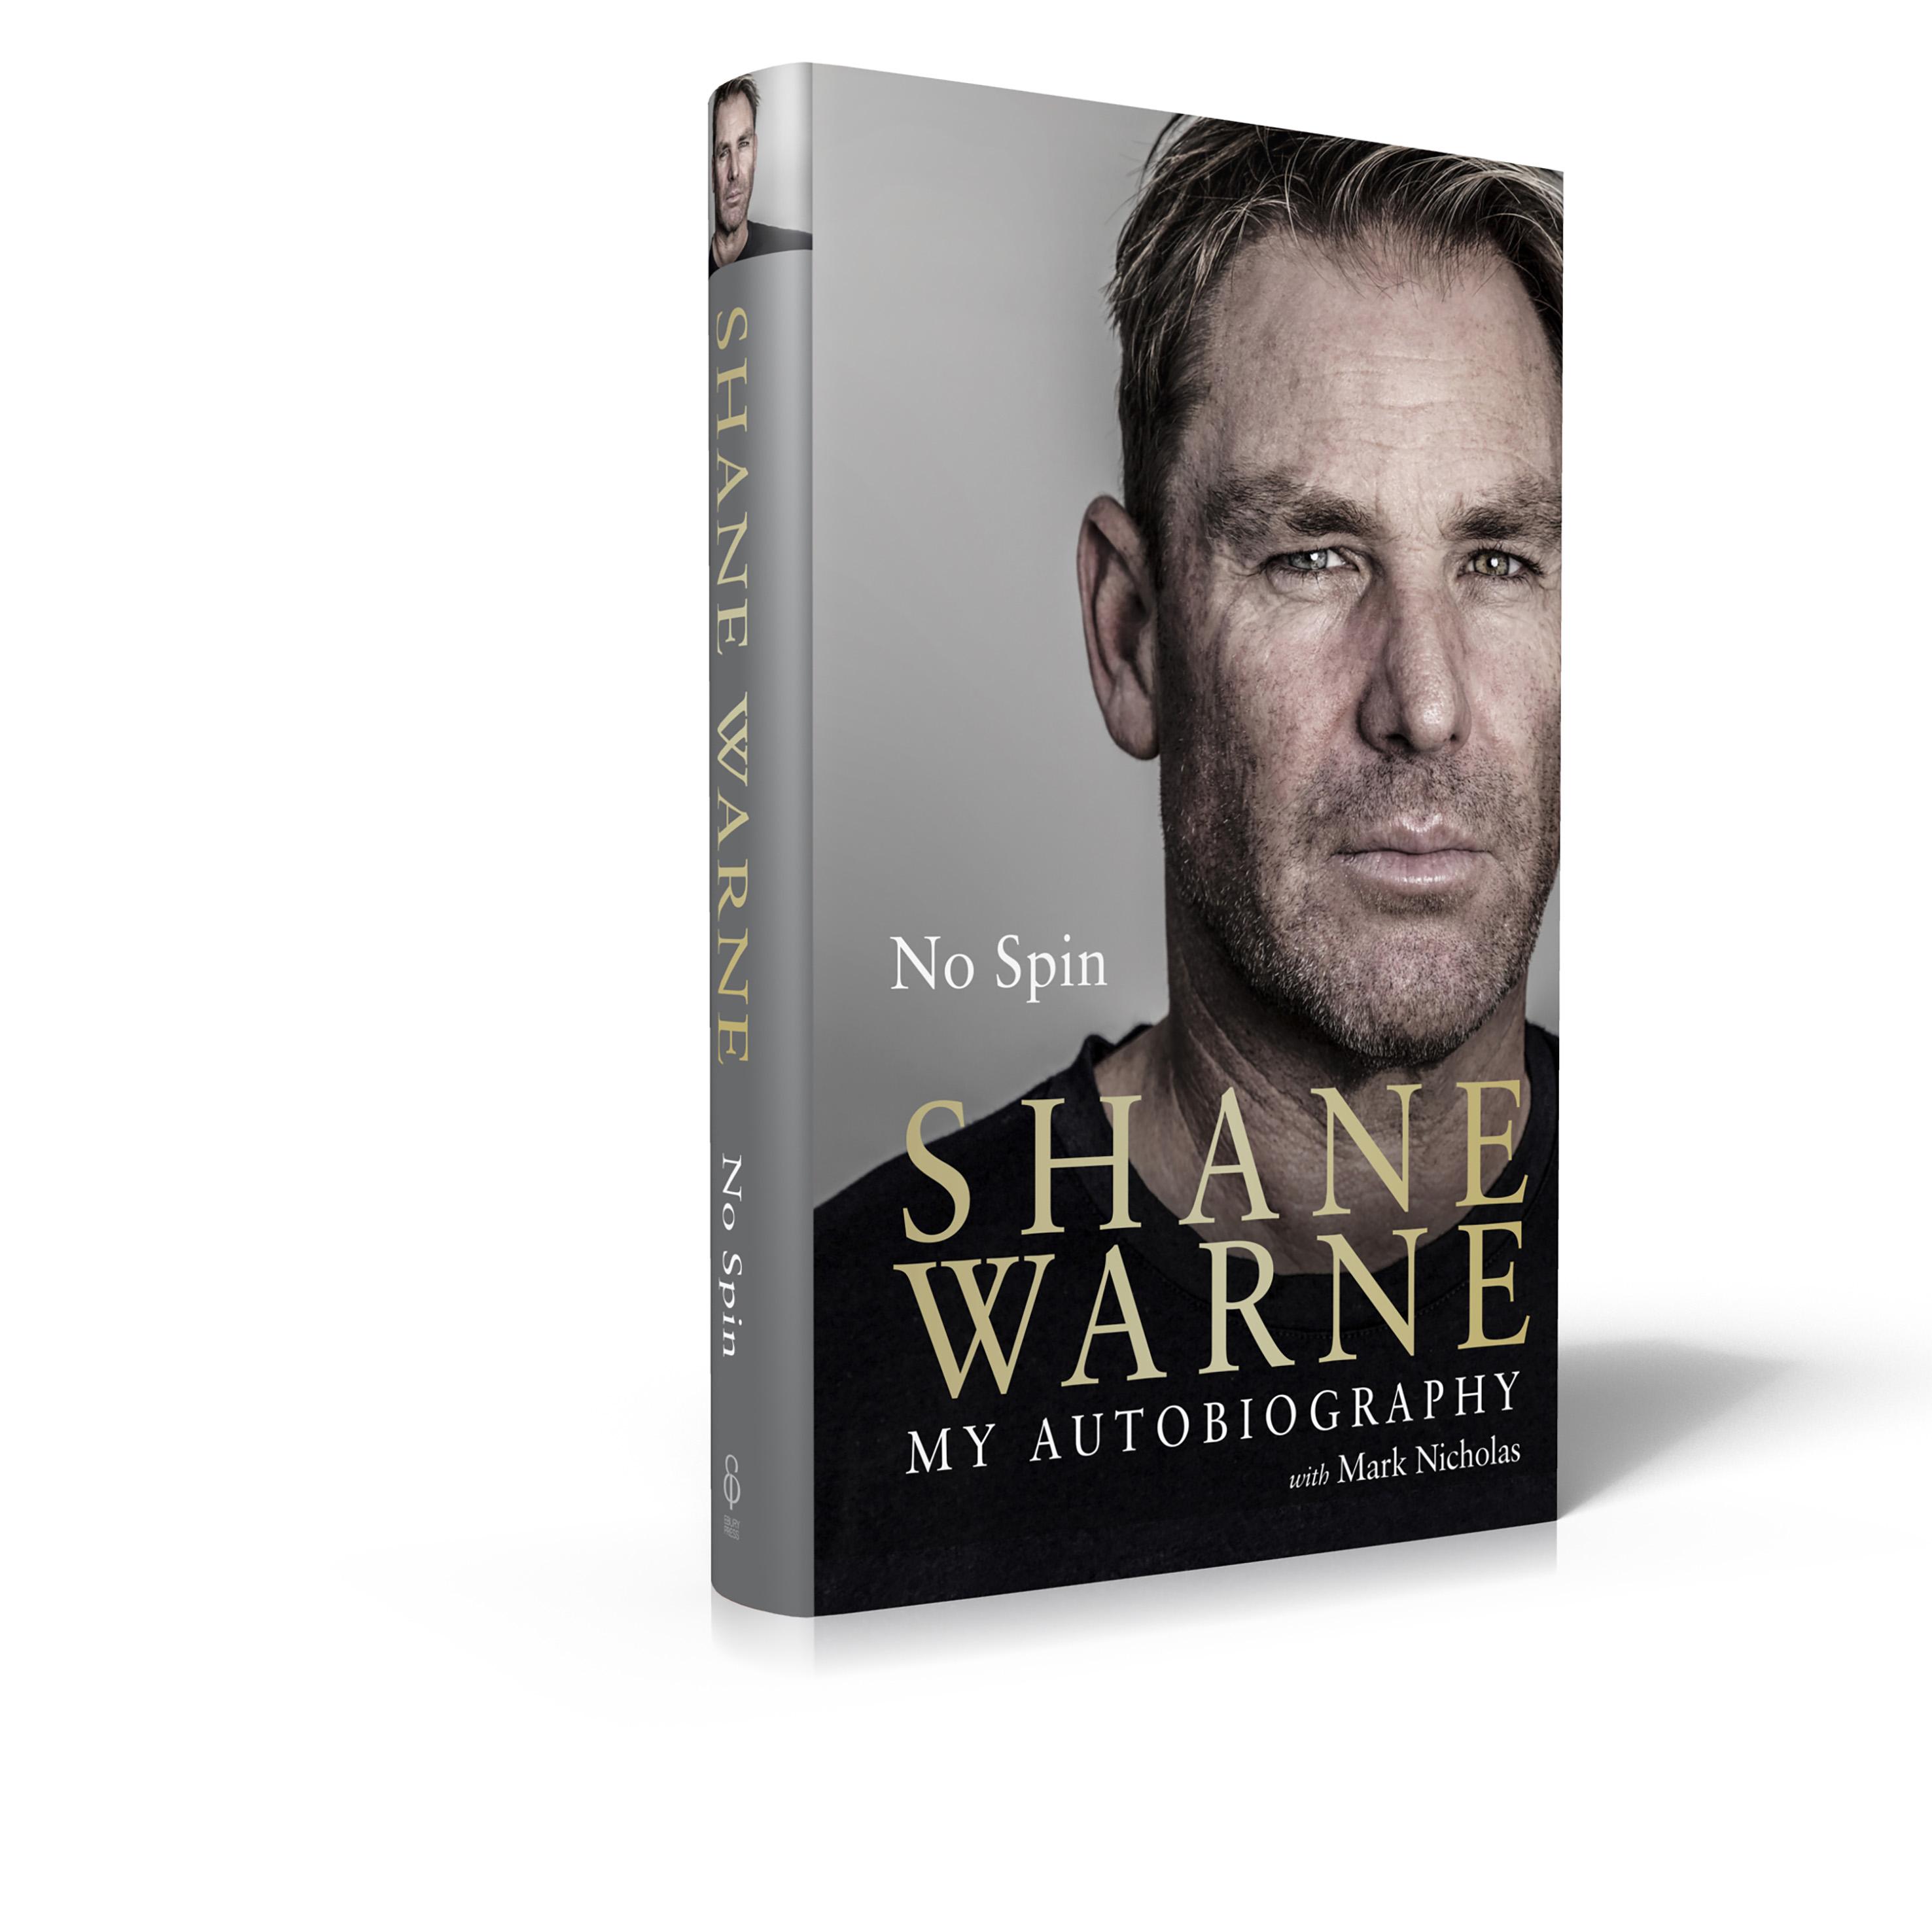 Shane Warne Autobiography 'No Spin'